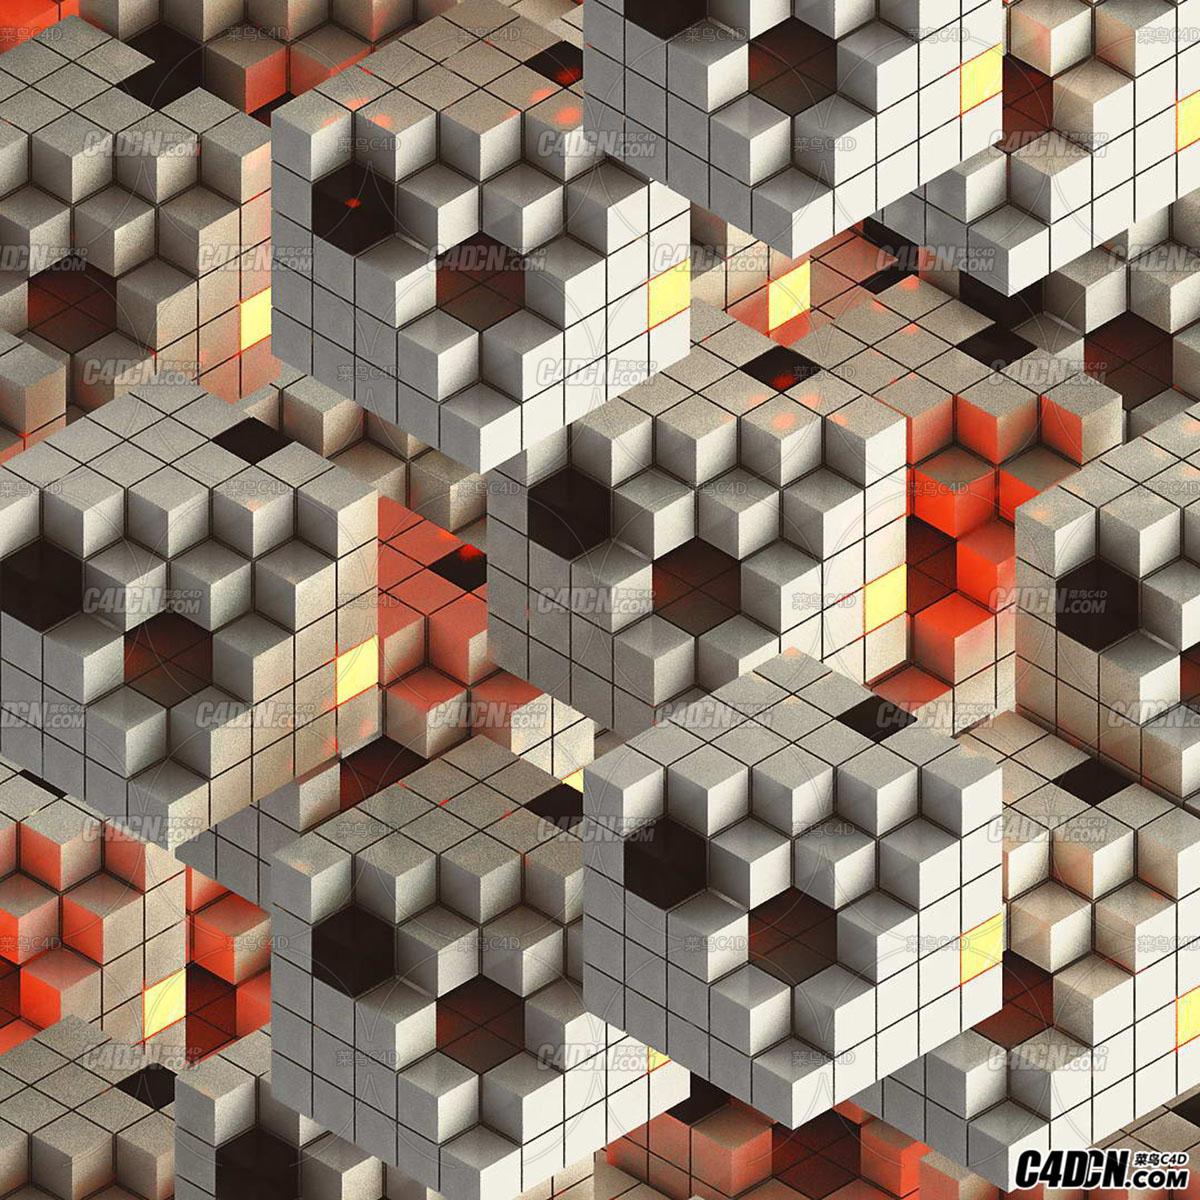 [26-05-16] - Rubiks.jpg